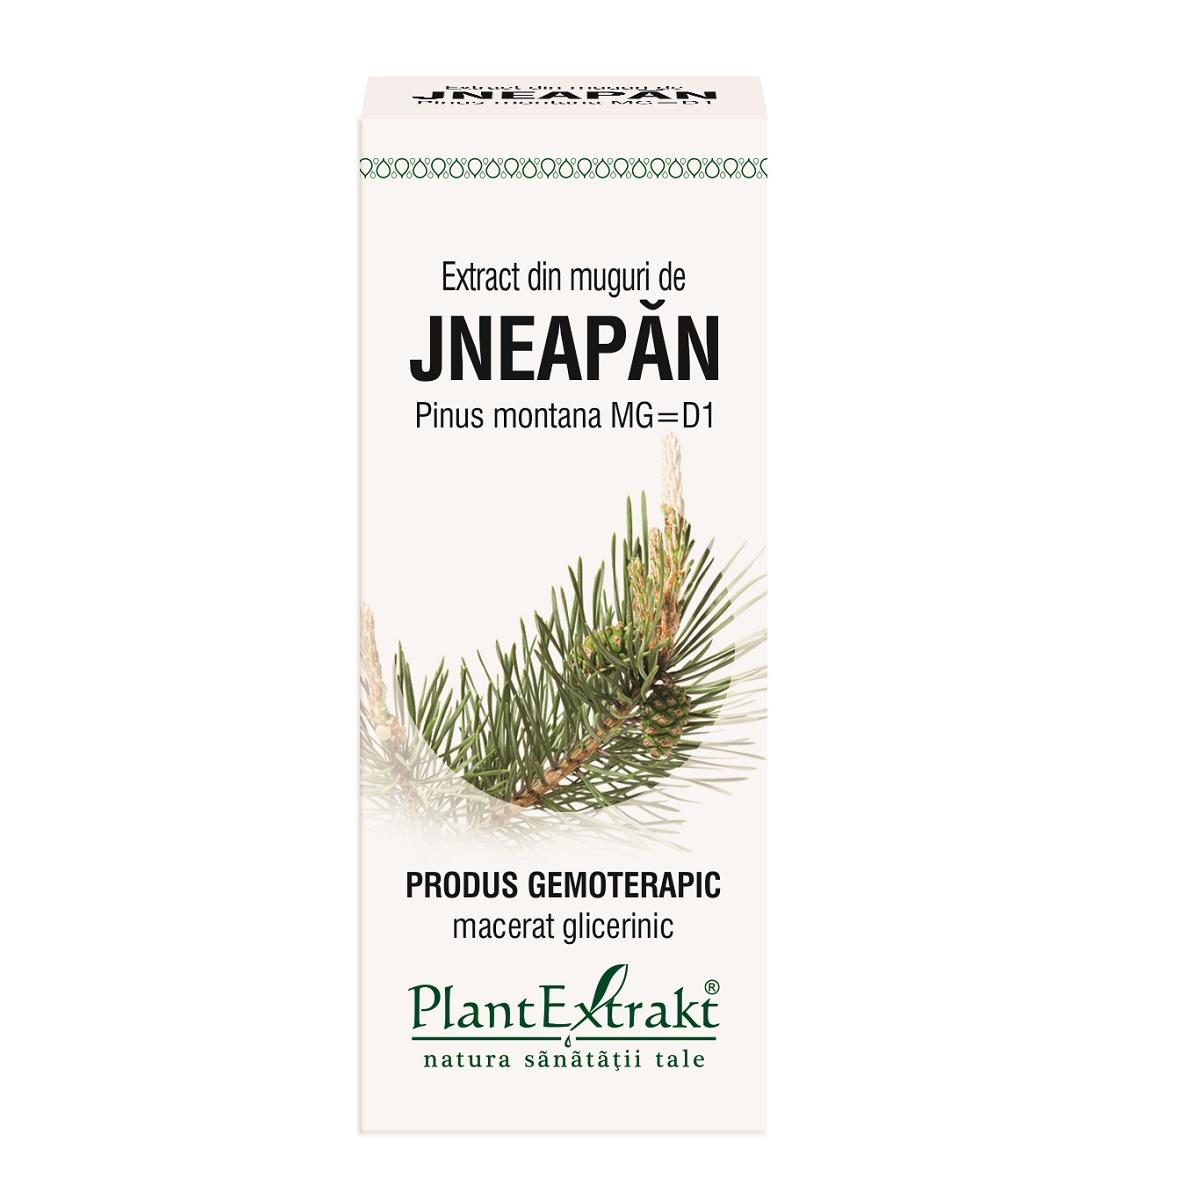 Extract din muguri de Jneapăn. 50 ml, Plant Extract